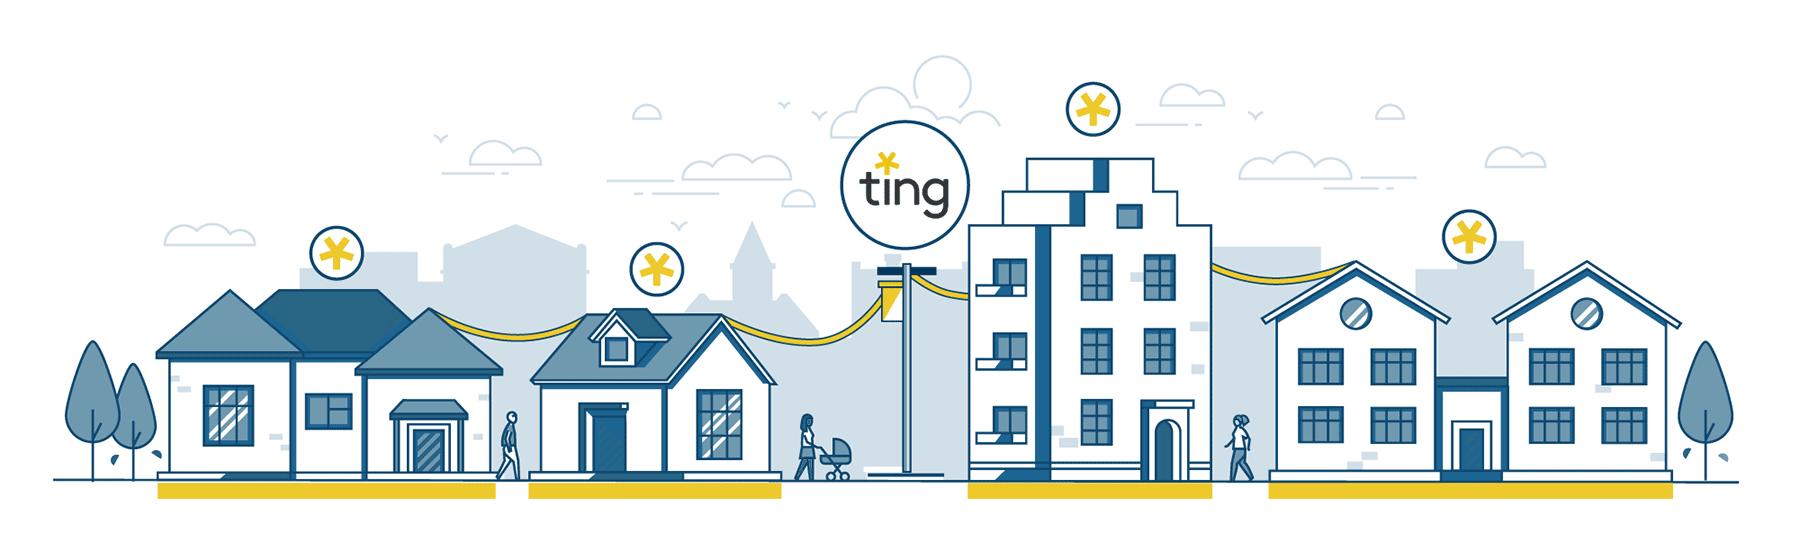 Ting-Neighborhood-Connectivity